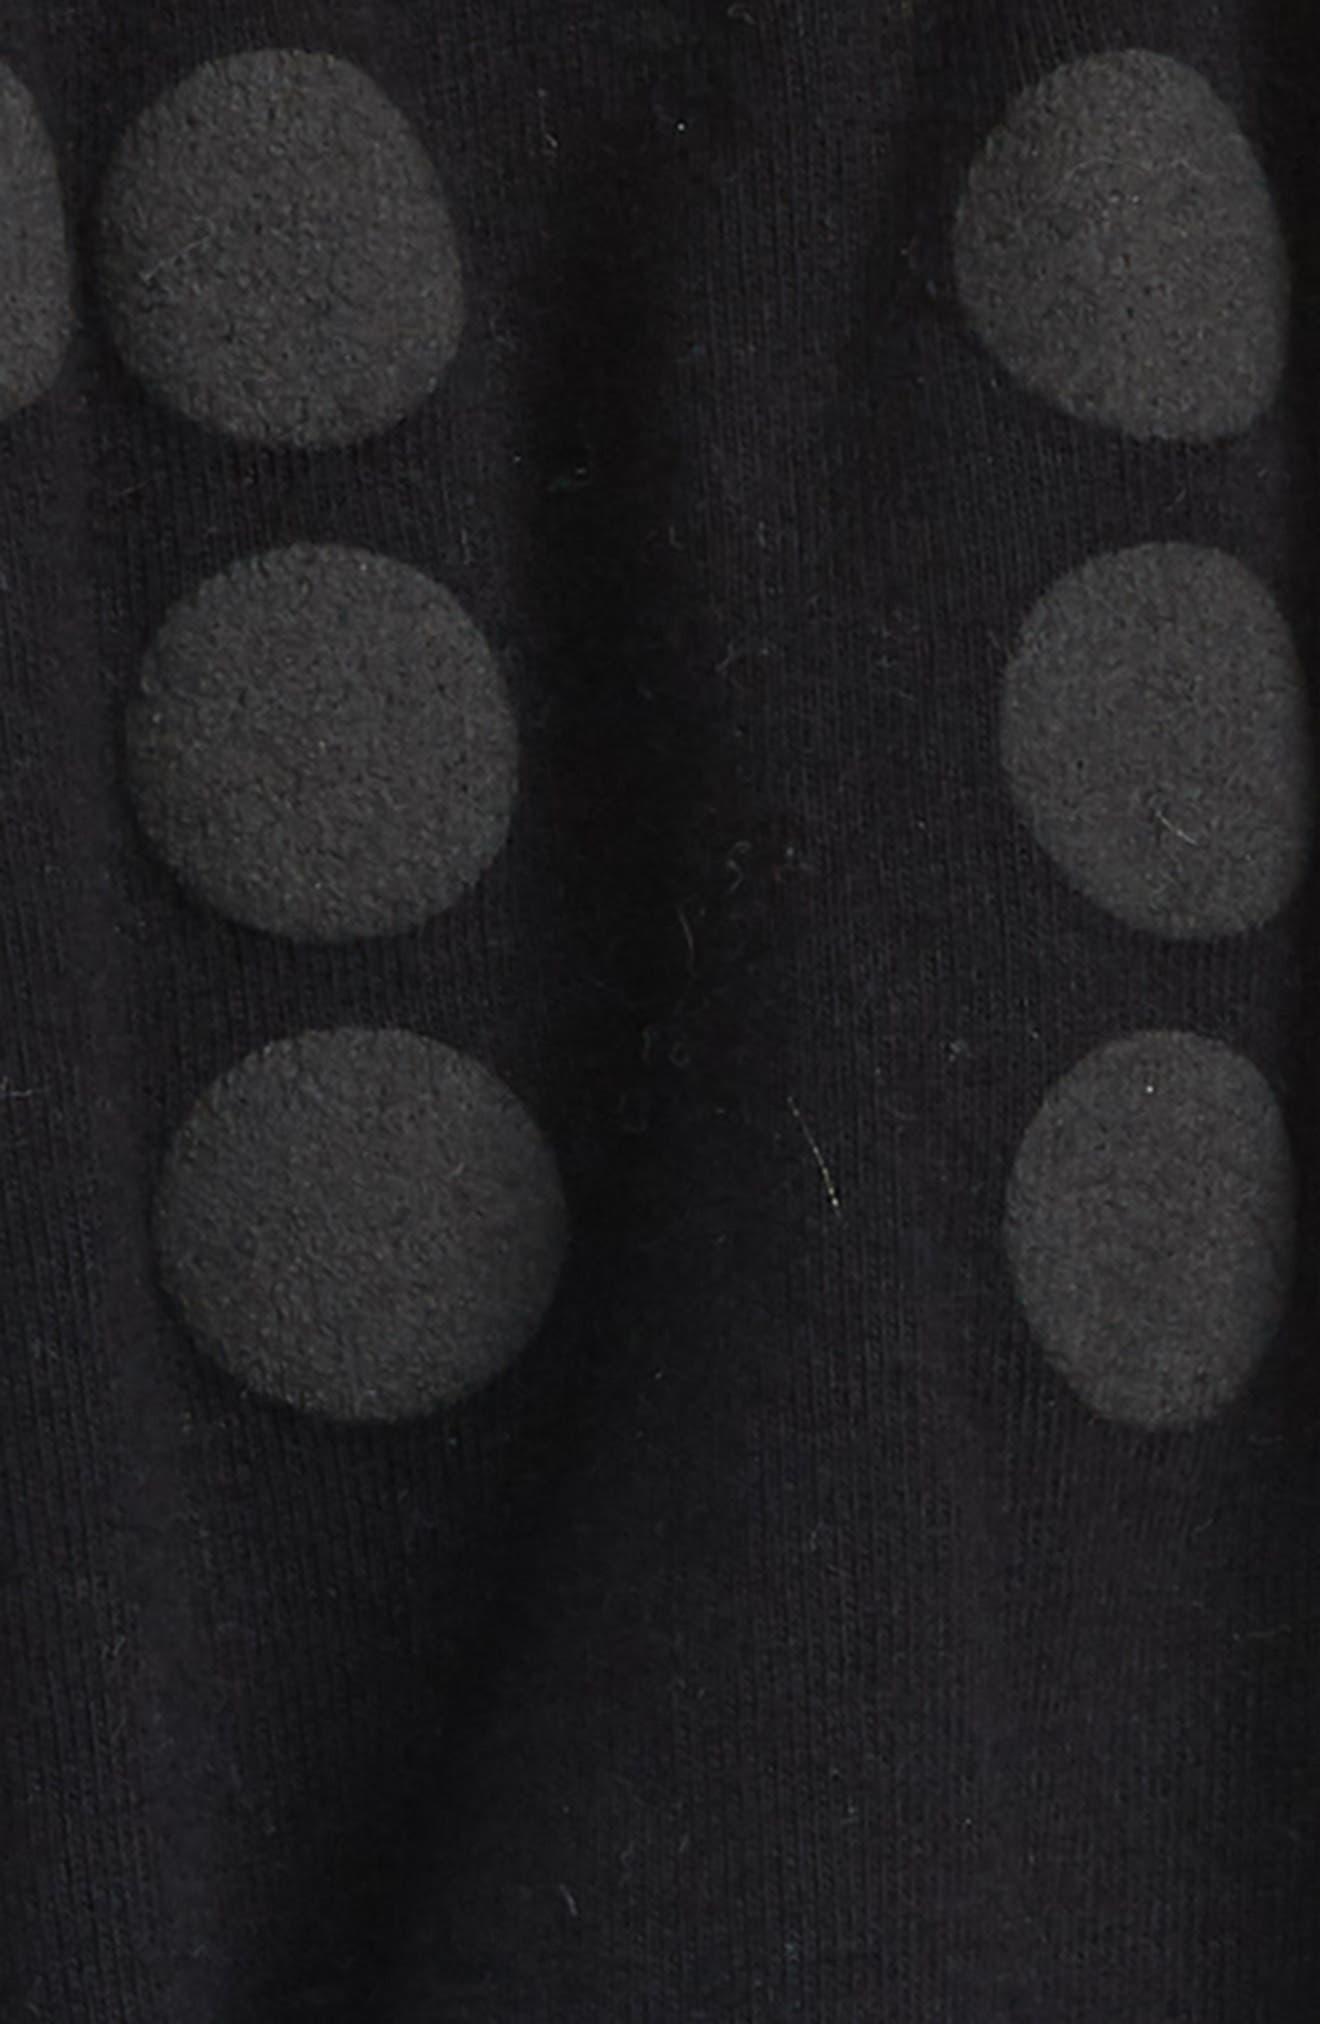 Braille Dot Jogger Pants,                             Alternate thumbnail 2, color,                             Black